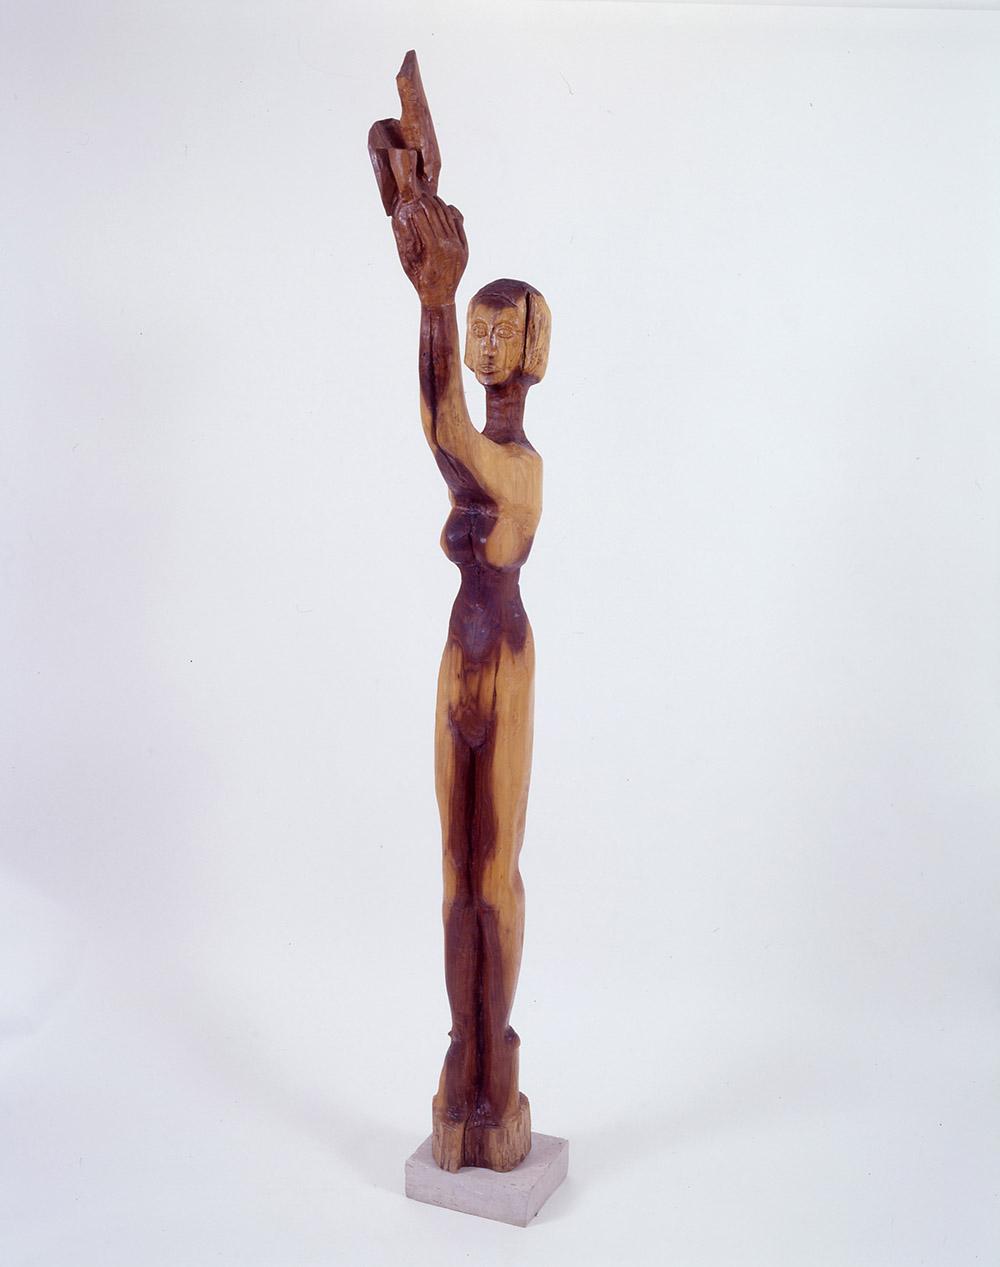 25.b-Ono-Capturing-Peace-1986.-Walnut-wood-38.1-x-30.5-x-20.3-cm-x.jpg